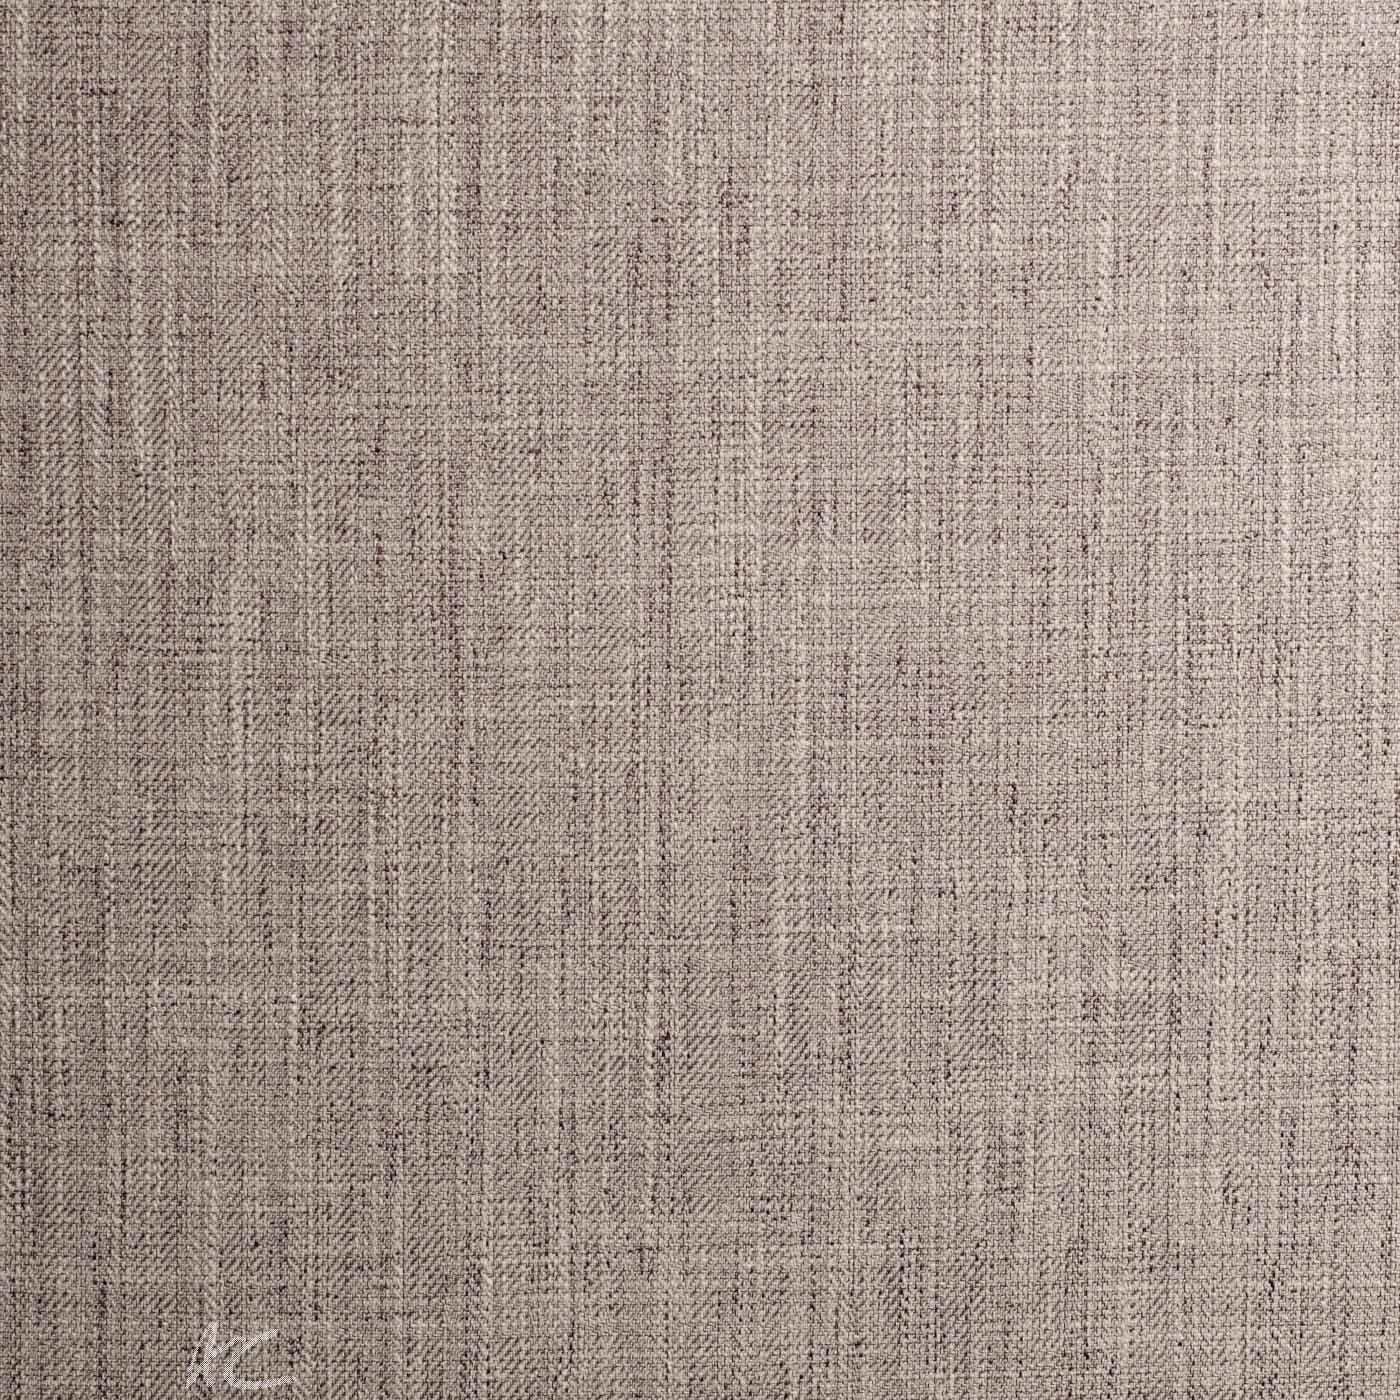 Spectrum Trend Dubarry Cushion Covers